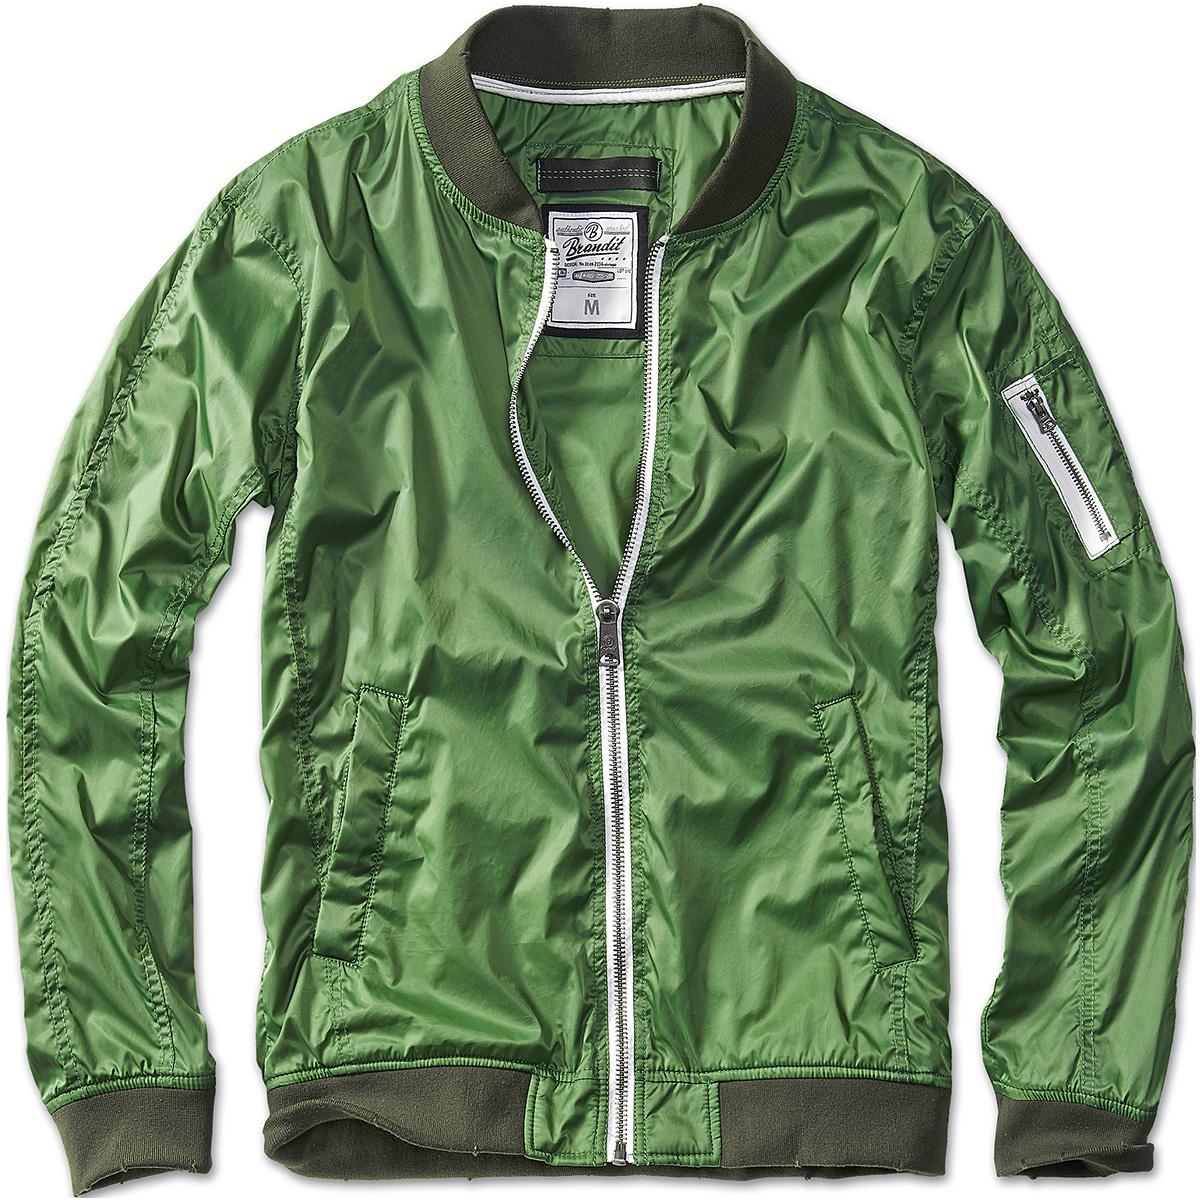 Brandit Portland Jacket Green | Other | Military 1st